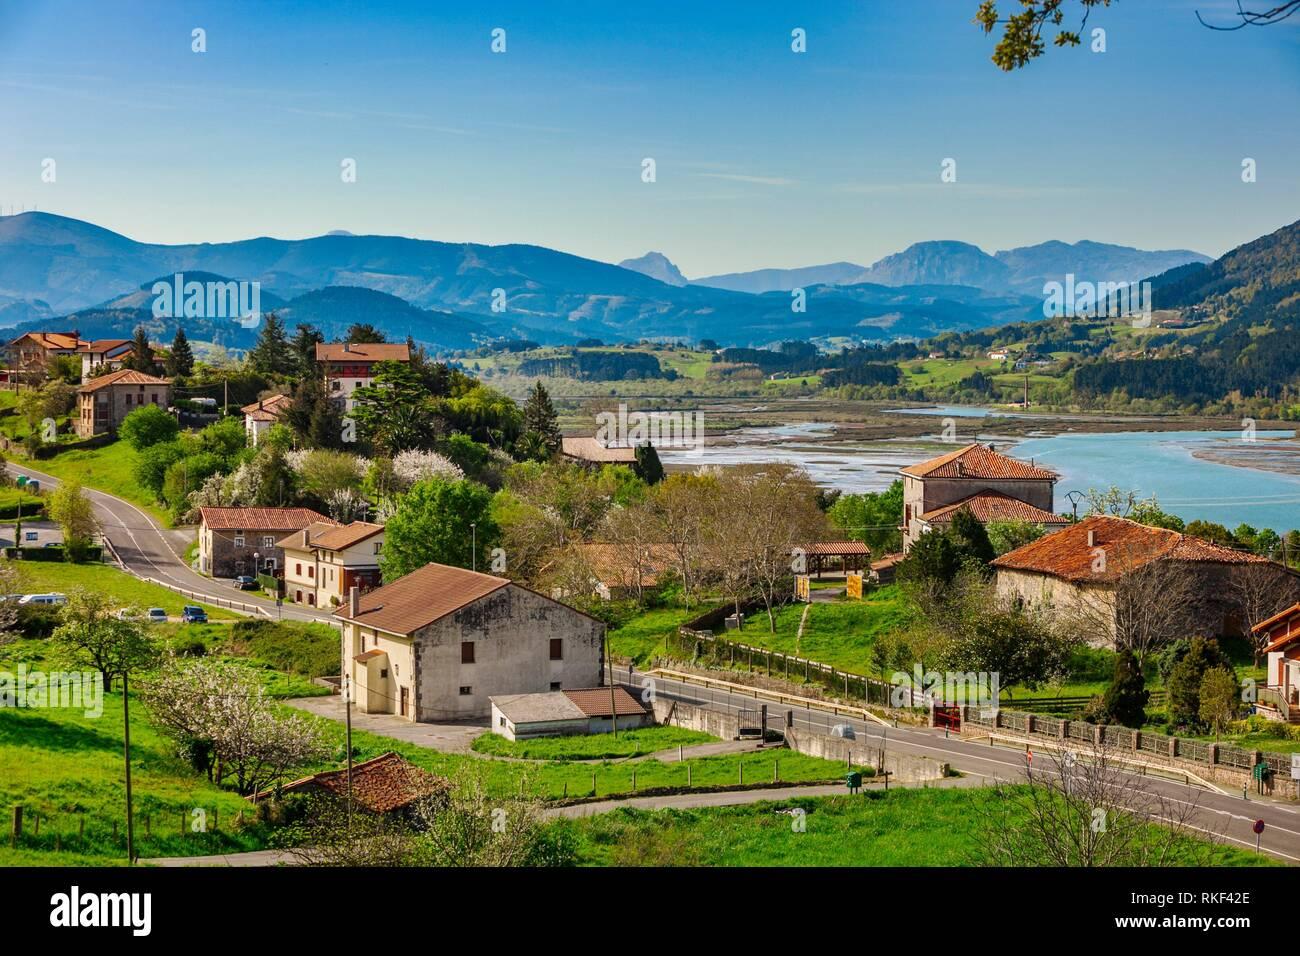 Kanala. Urdaibai Biosphere Reserve. Biscay, Basque Country, Spain. - Stock Image